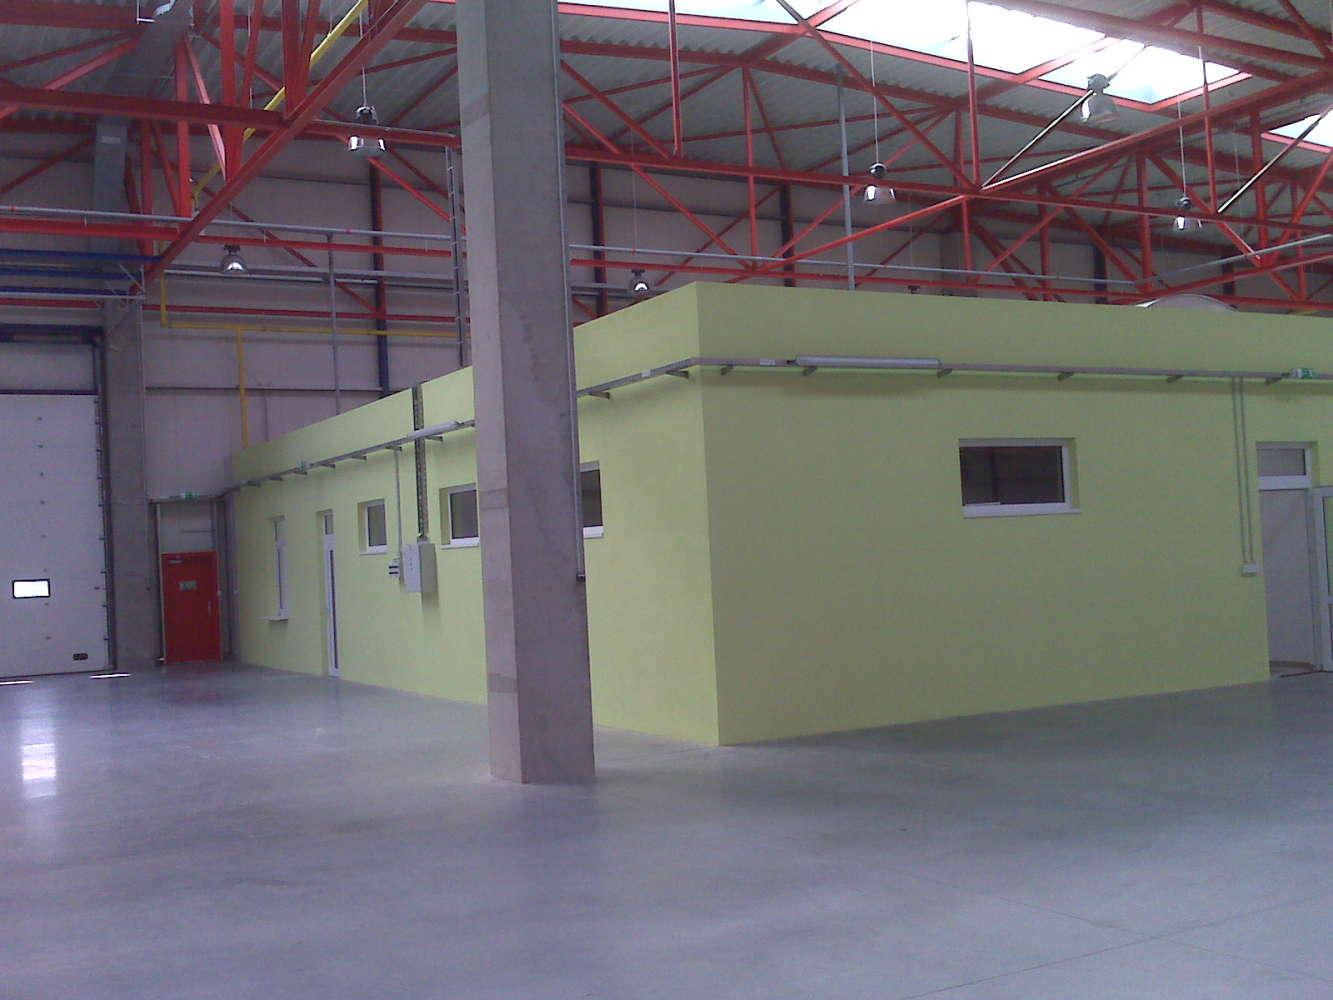 Industrial and logistics Mlada boleslav - bezdecin,  - UNO Park Mladá Boleslav - Bezděčín - 255089217630160